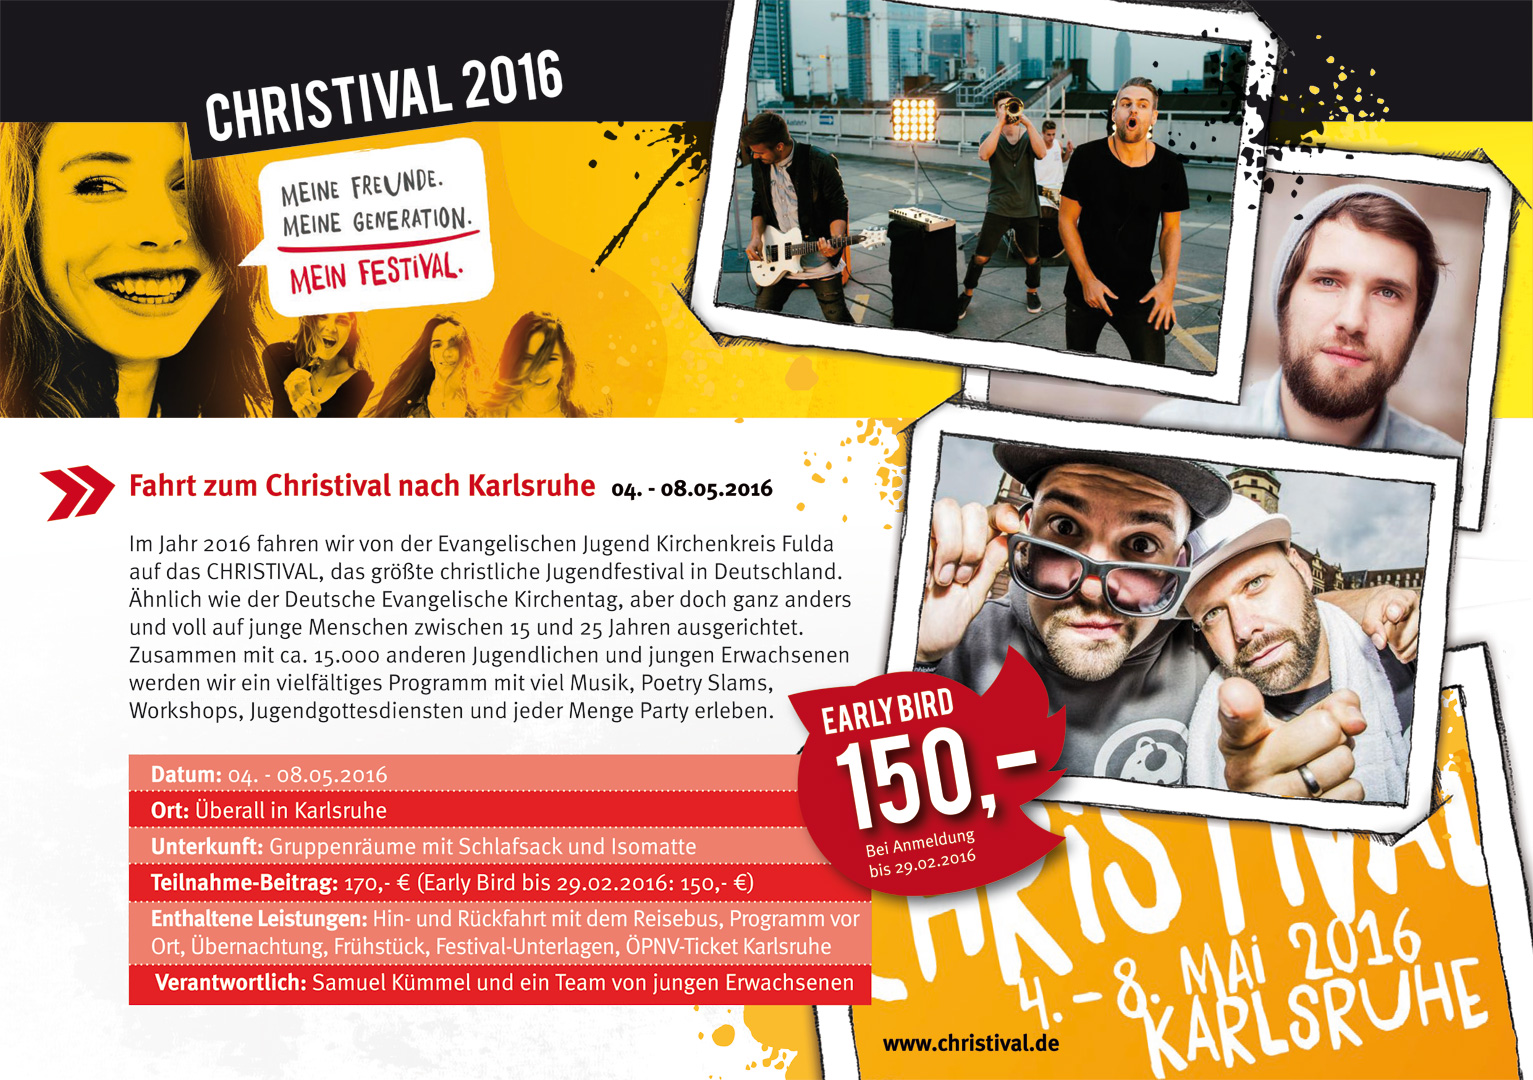 Christival 2016 Überblick